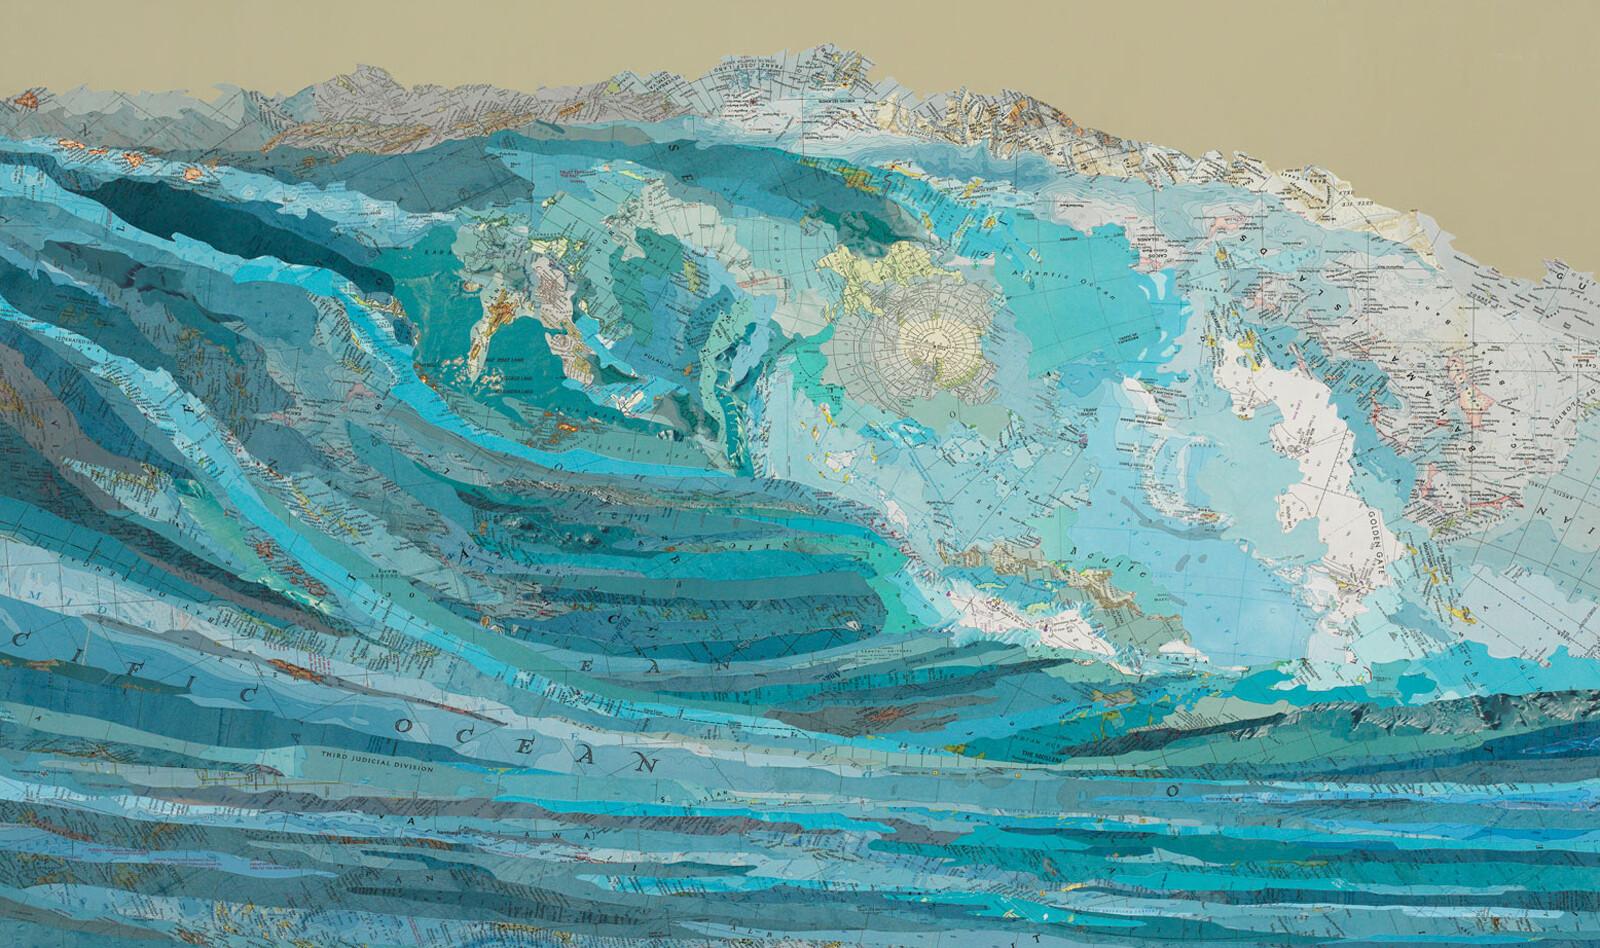 Kara's wave - Matthew Cusick